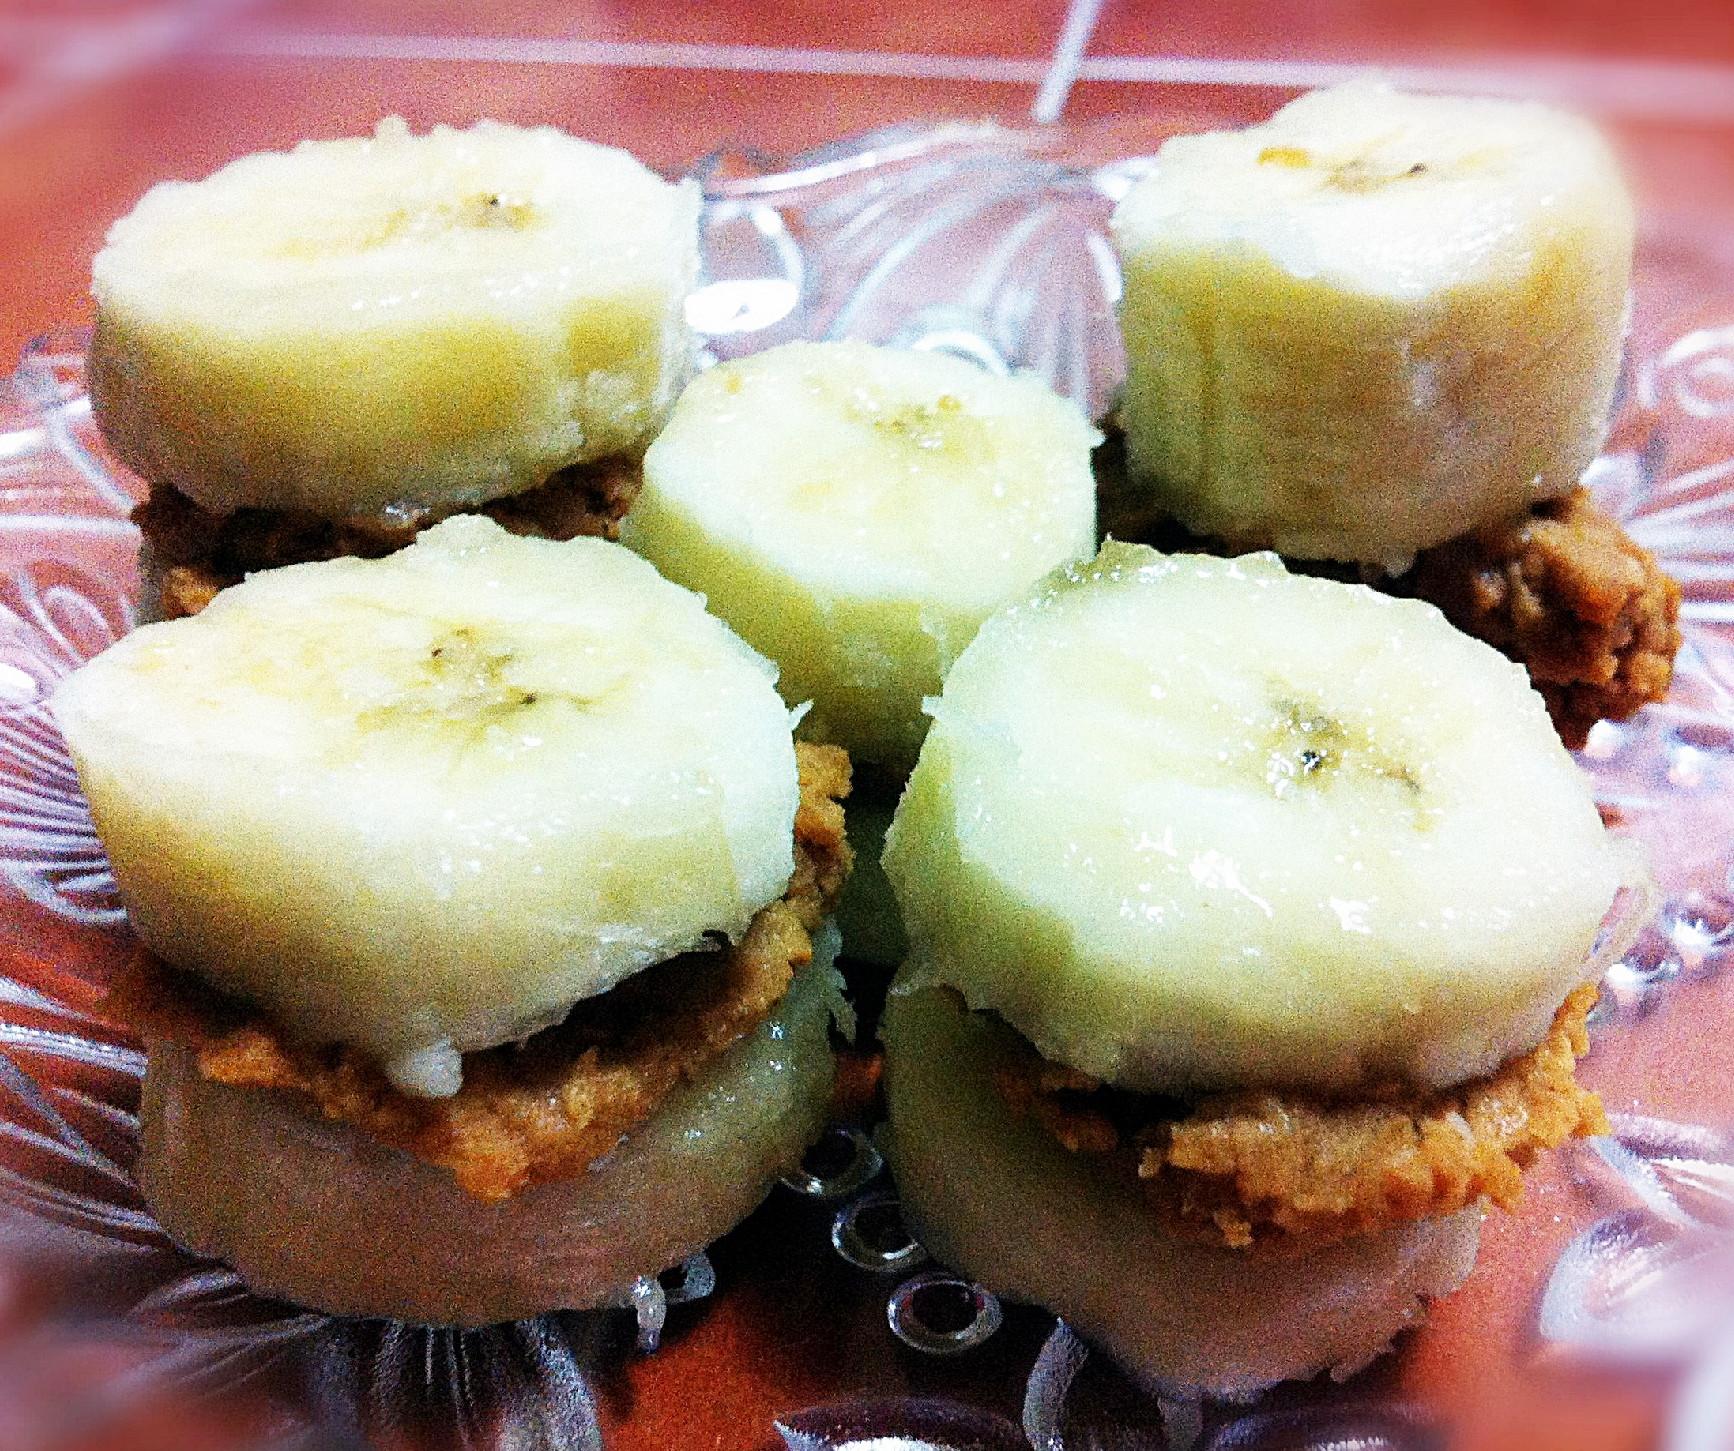 Quick Healthy Desserts  Healthy Dessert Ideas Banana and Peanut Butter Bites